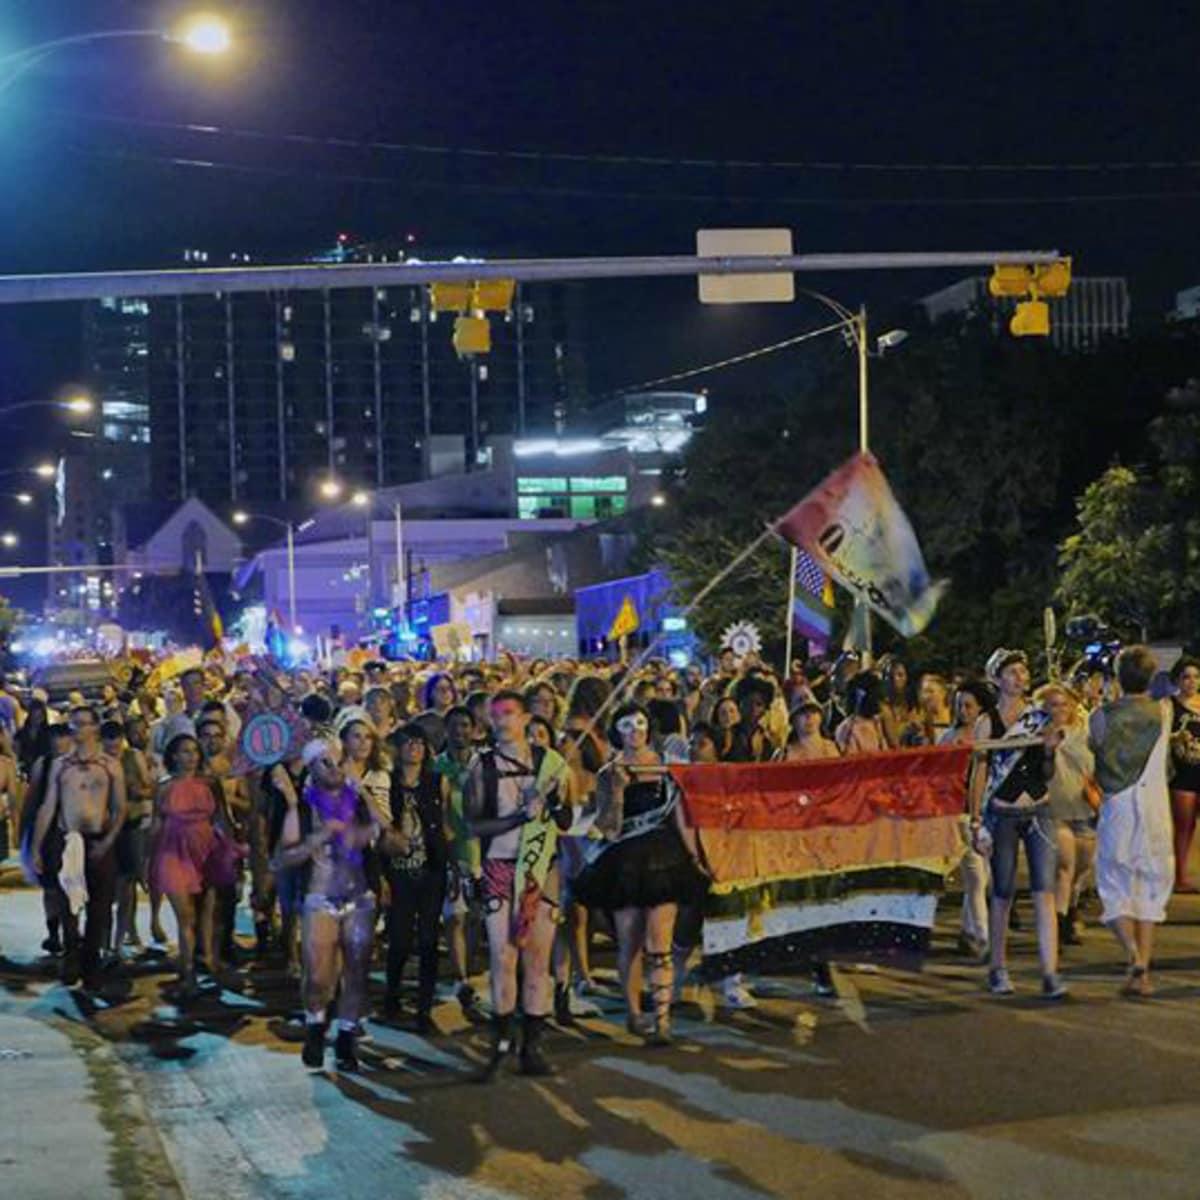 QueerBomb_Austin_LGBT pride parade_Pine Street Station_2014